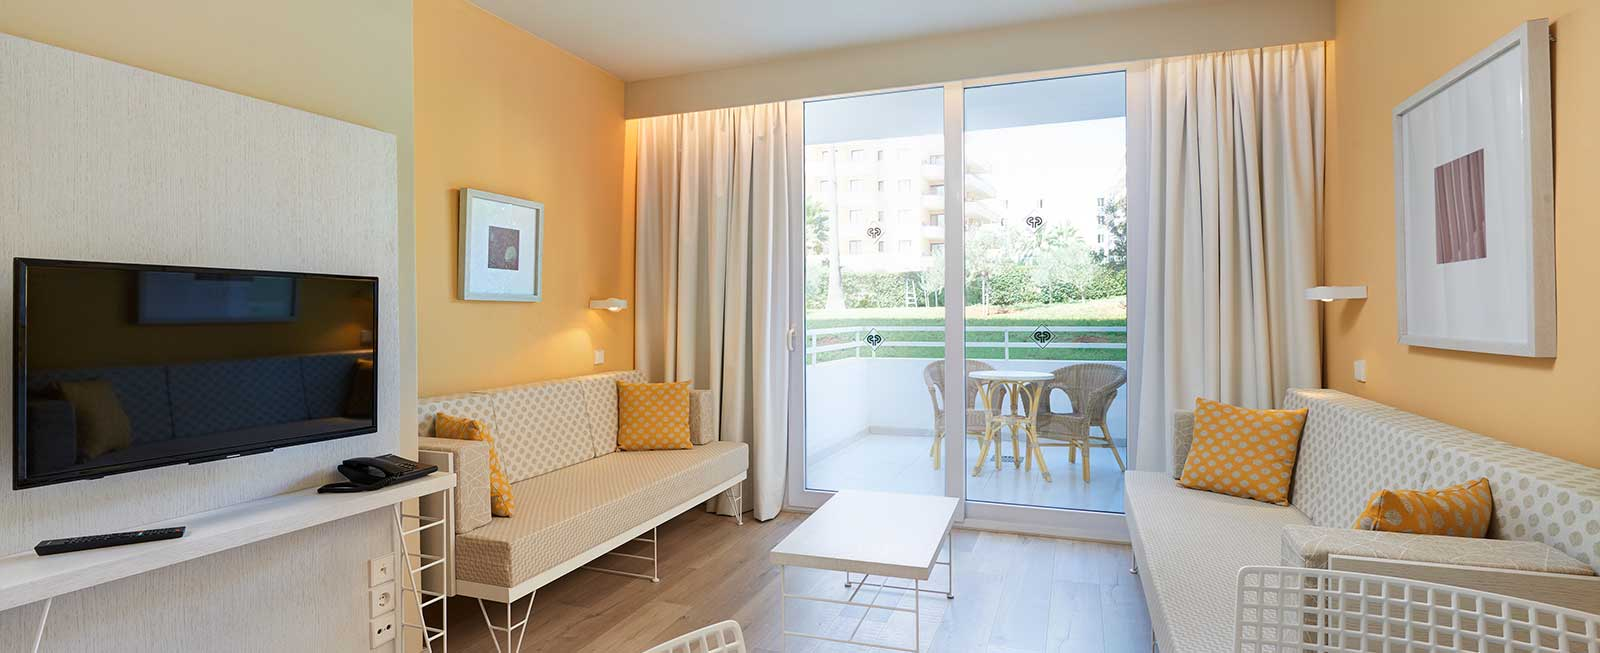 Apartamento Protur Vista Badia Aparthotel